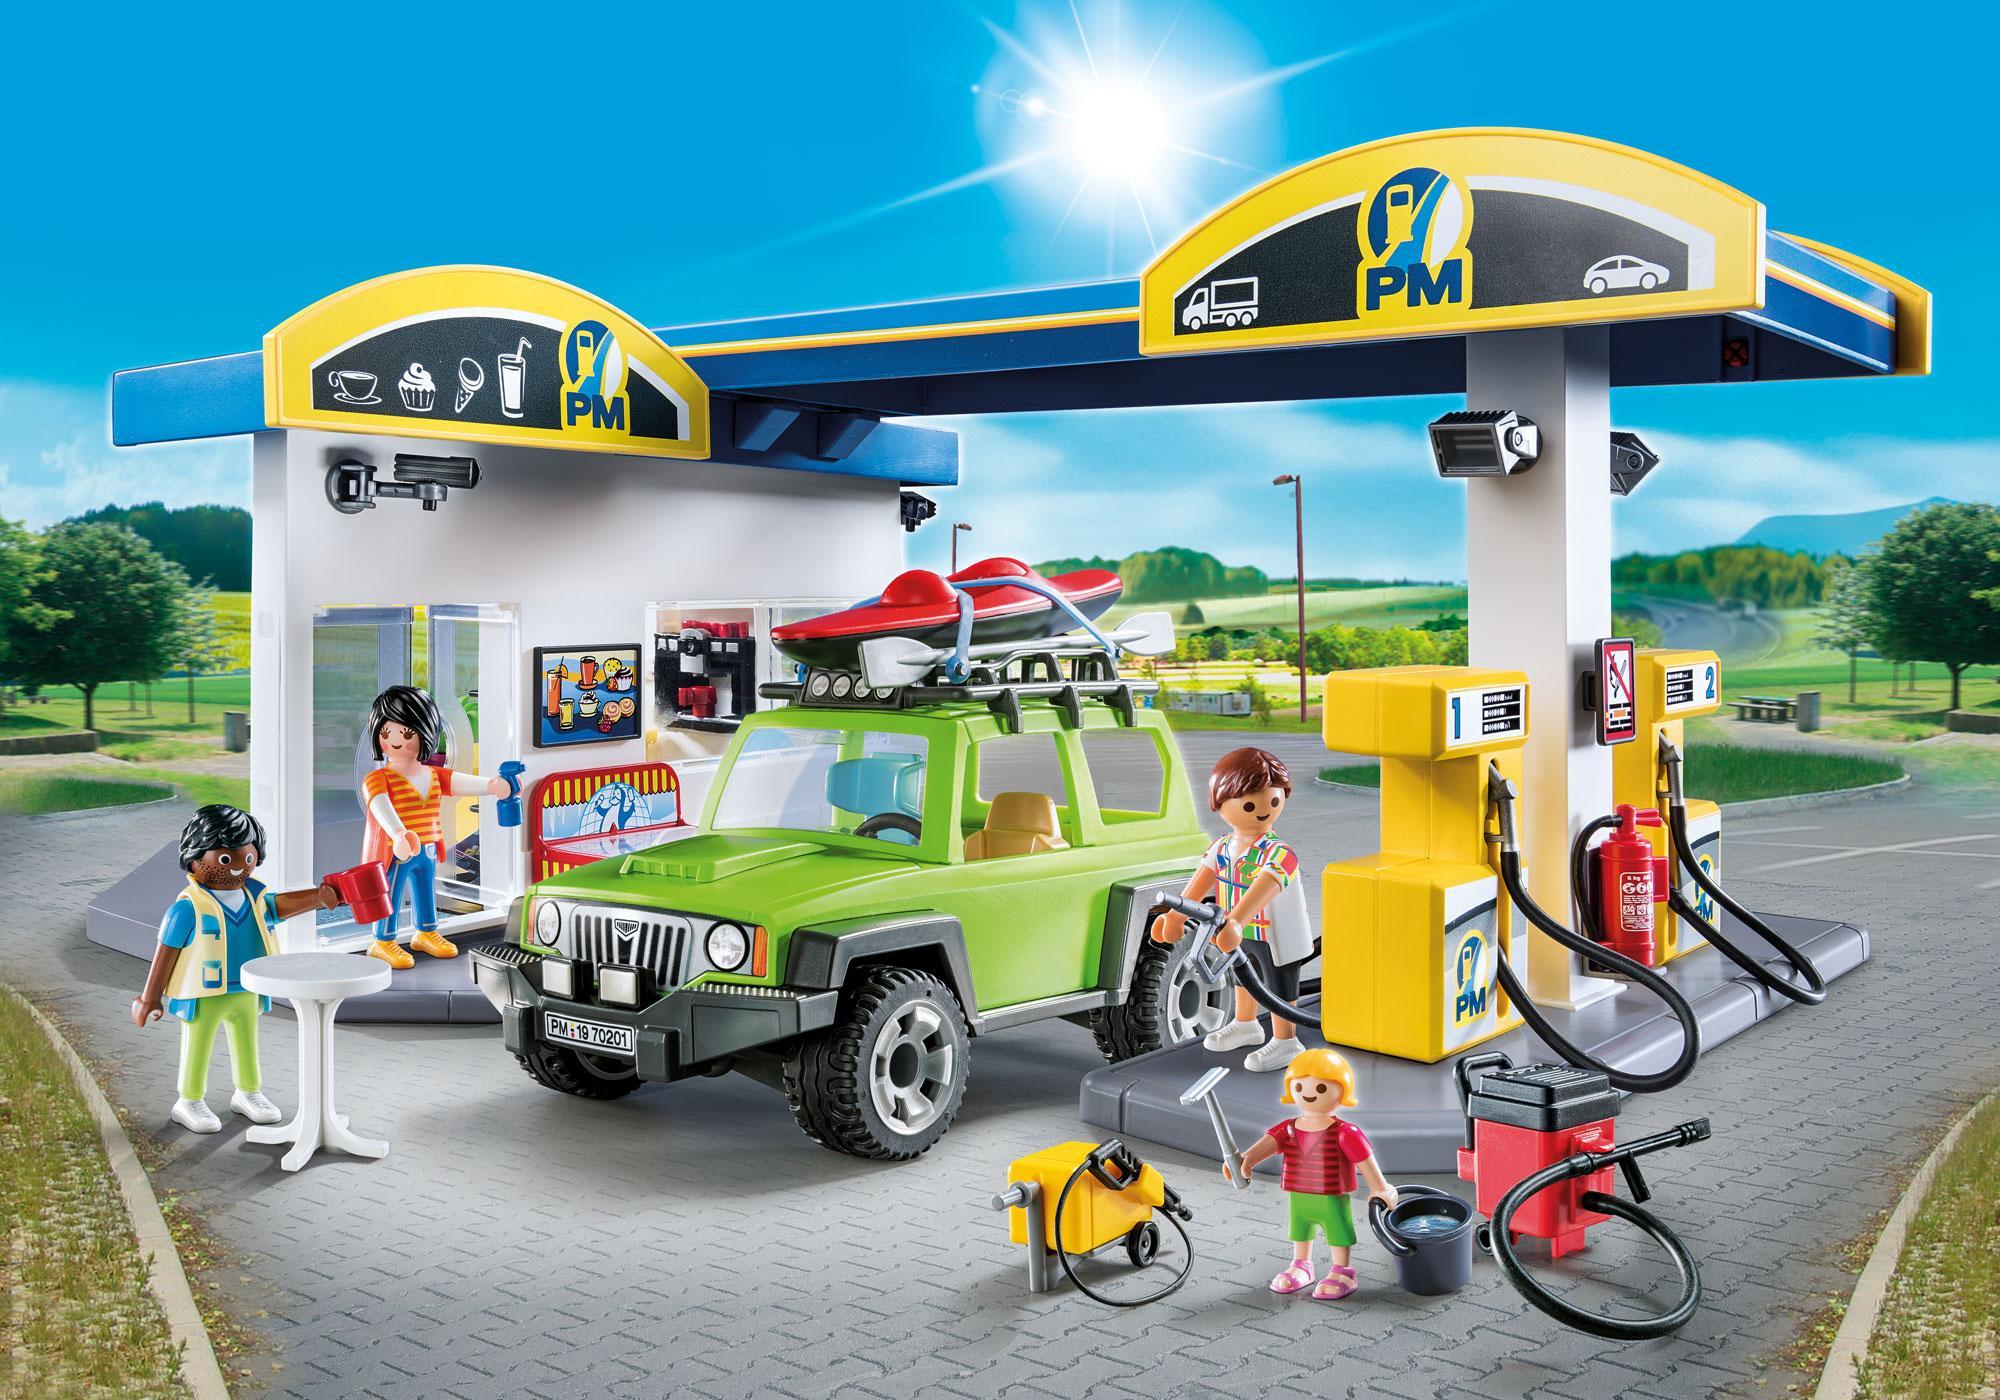 http://media.playmobil.com/i/playmobil/70201_product_detail/Stazione di servizio